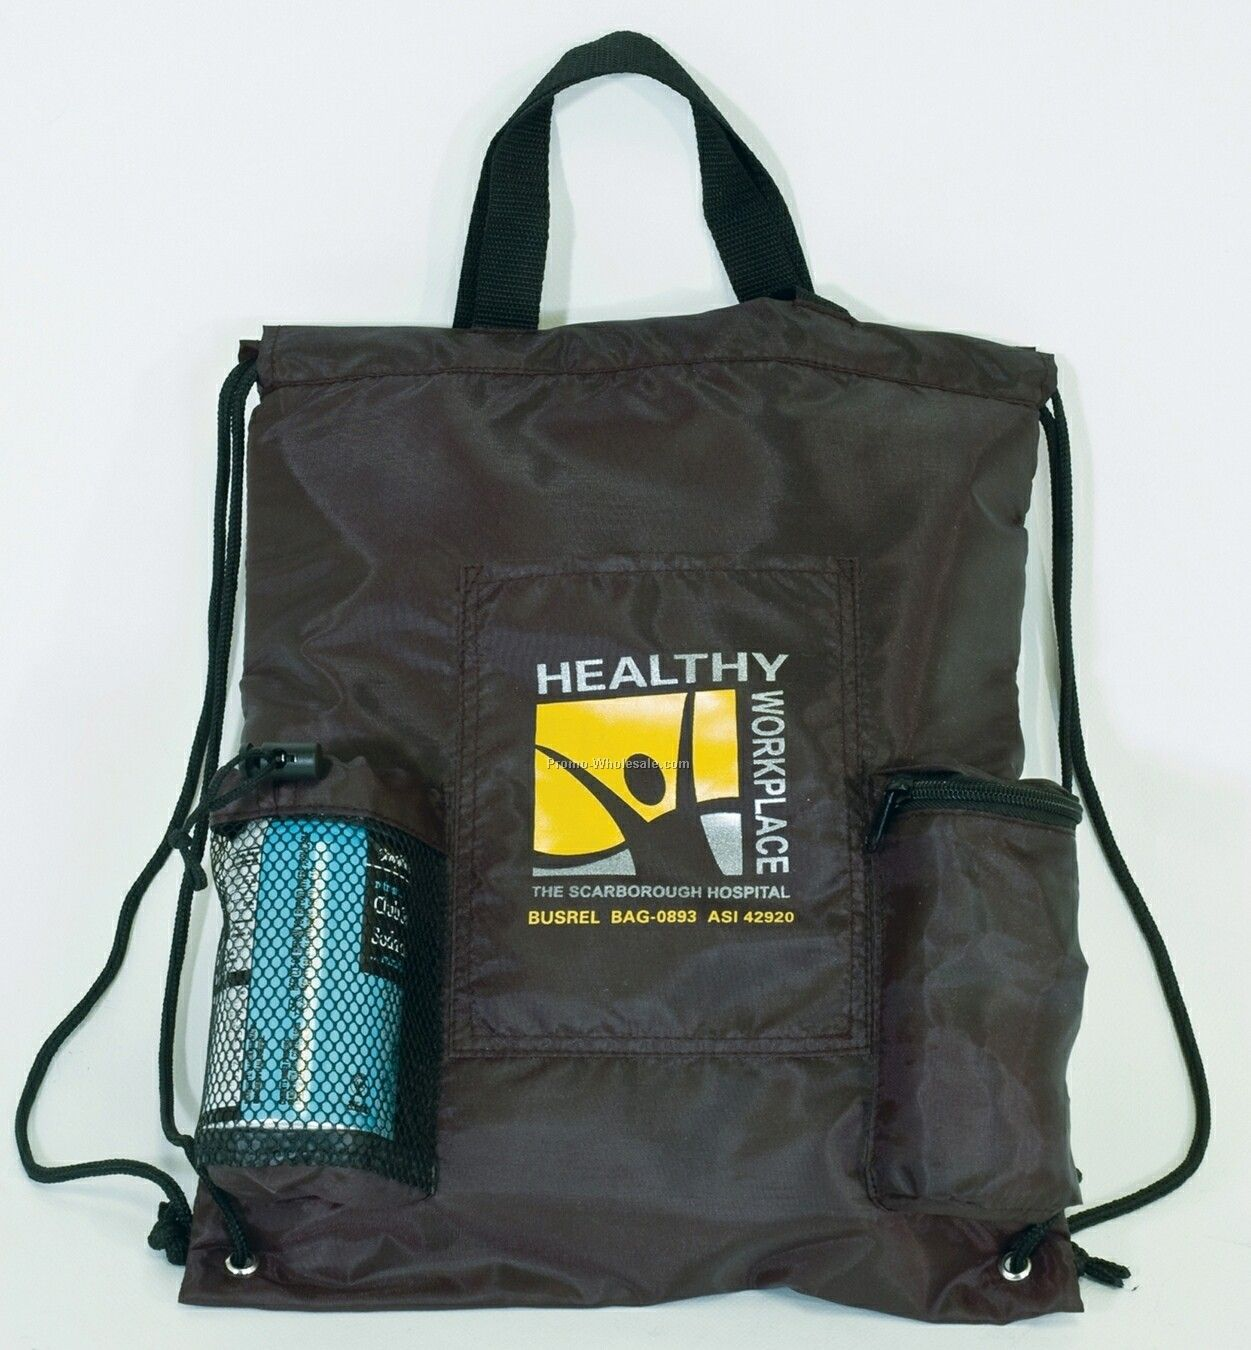 210d Polyester Drawstring Backpack Cooler W/ Mesh Pockets